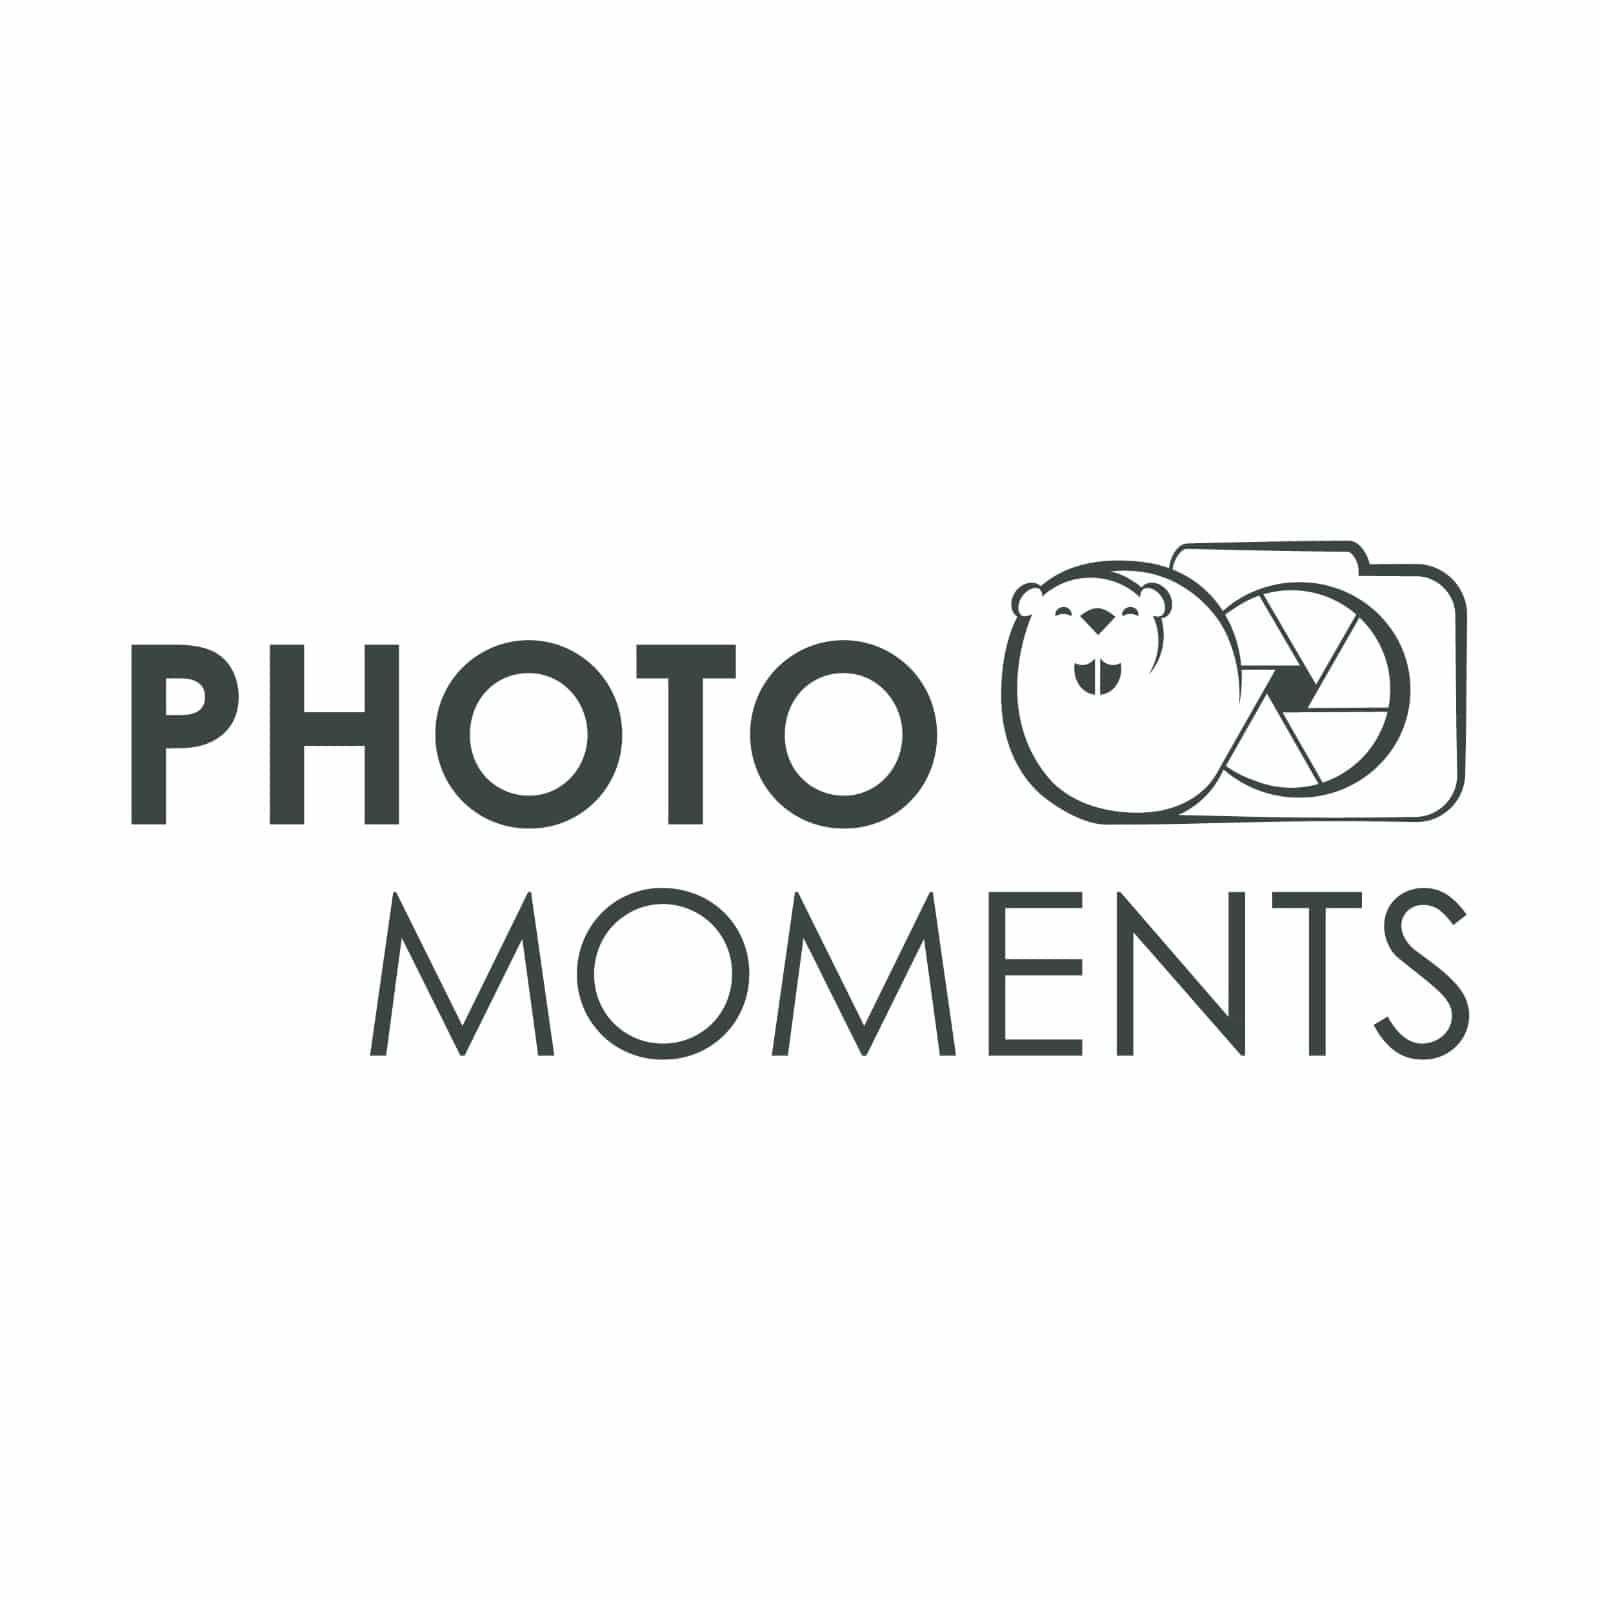 logo photo moments